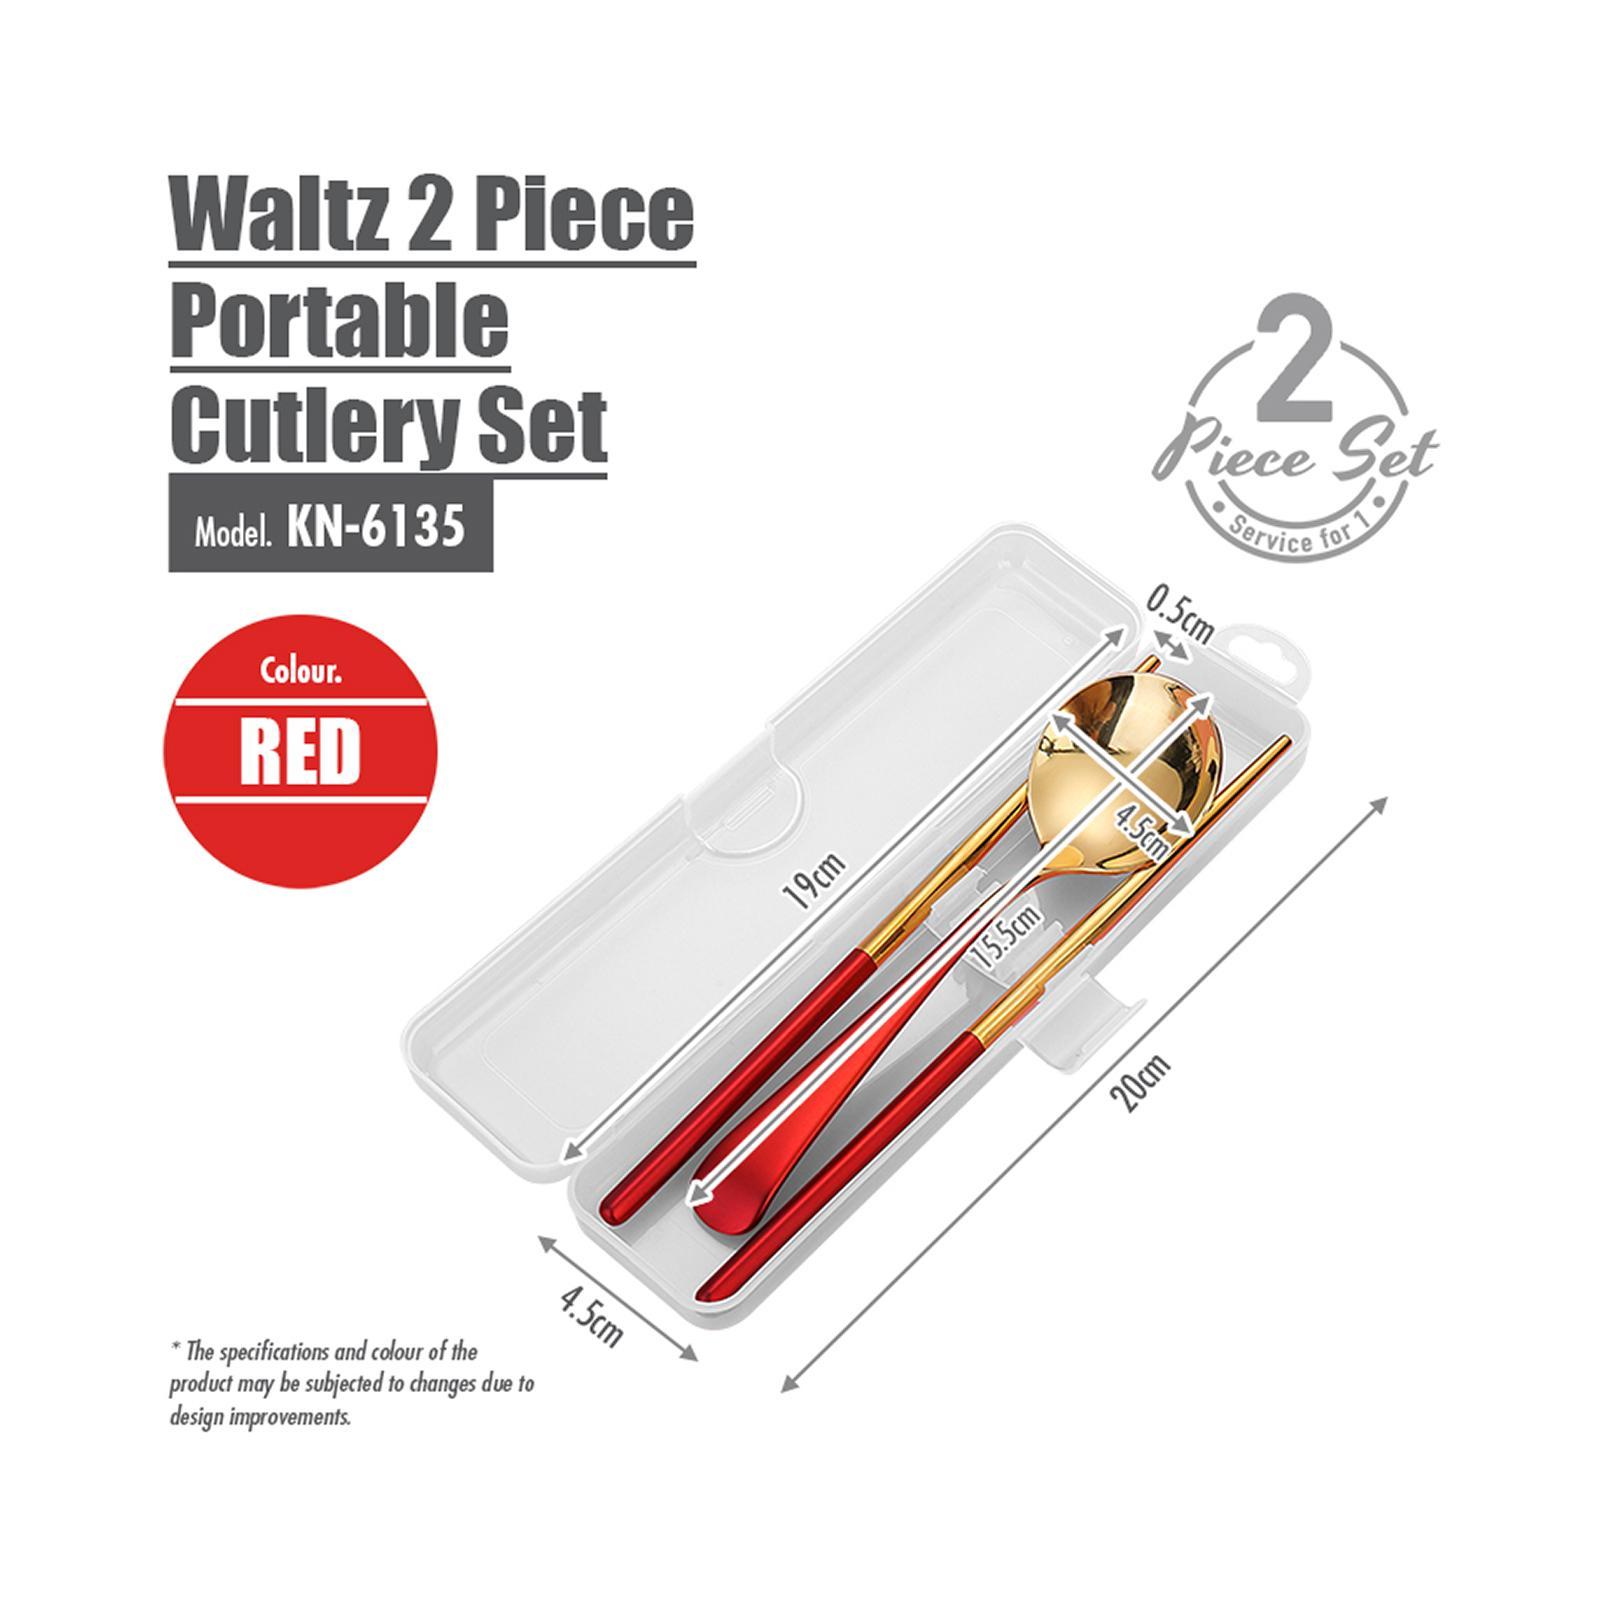 HOUZE Waltz 2 Piece Portable Cutlery Set - Red